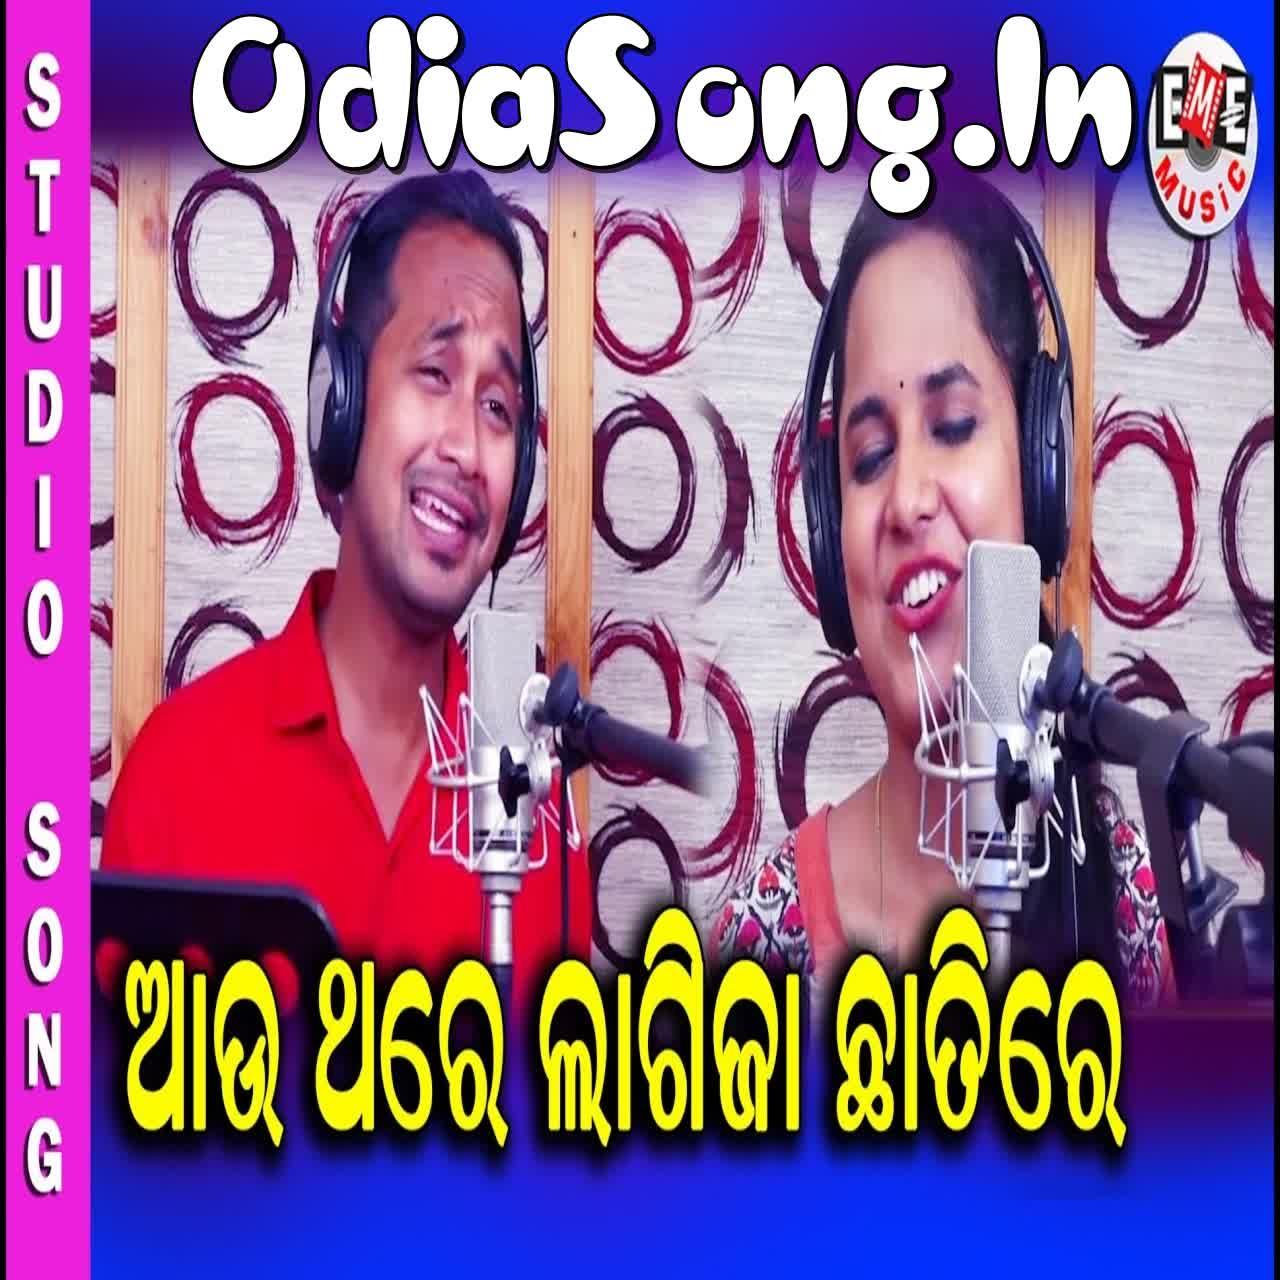 Au Thare Lagija Chhatire (Asima Panda, Satyajit)